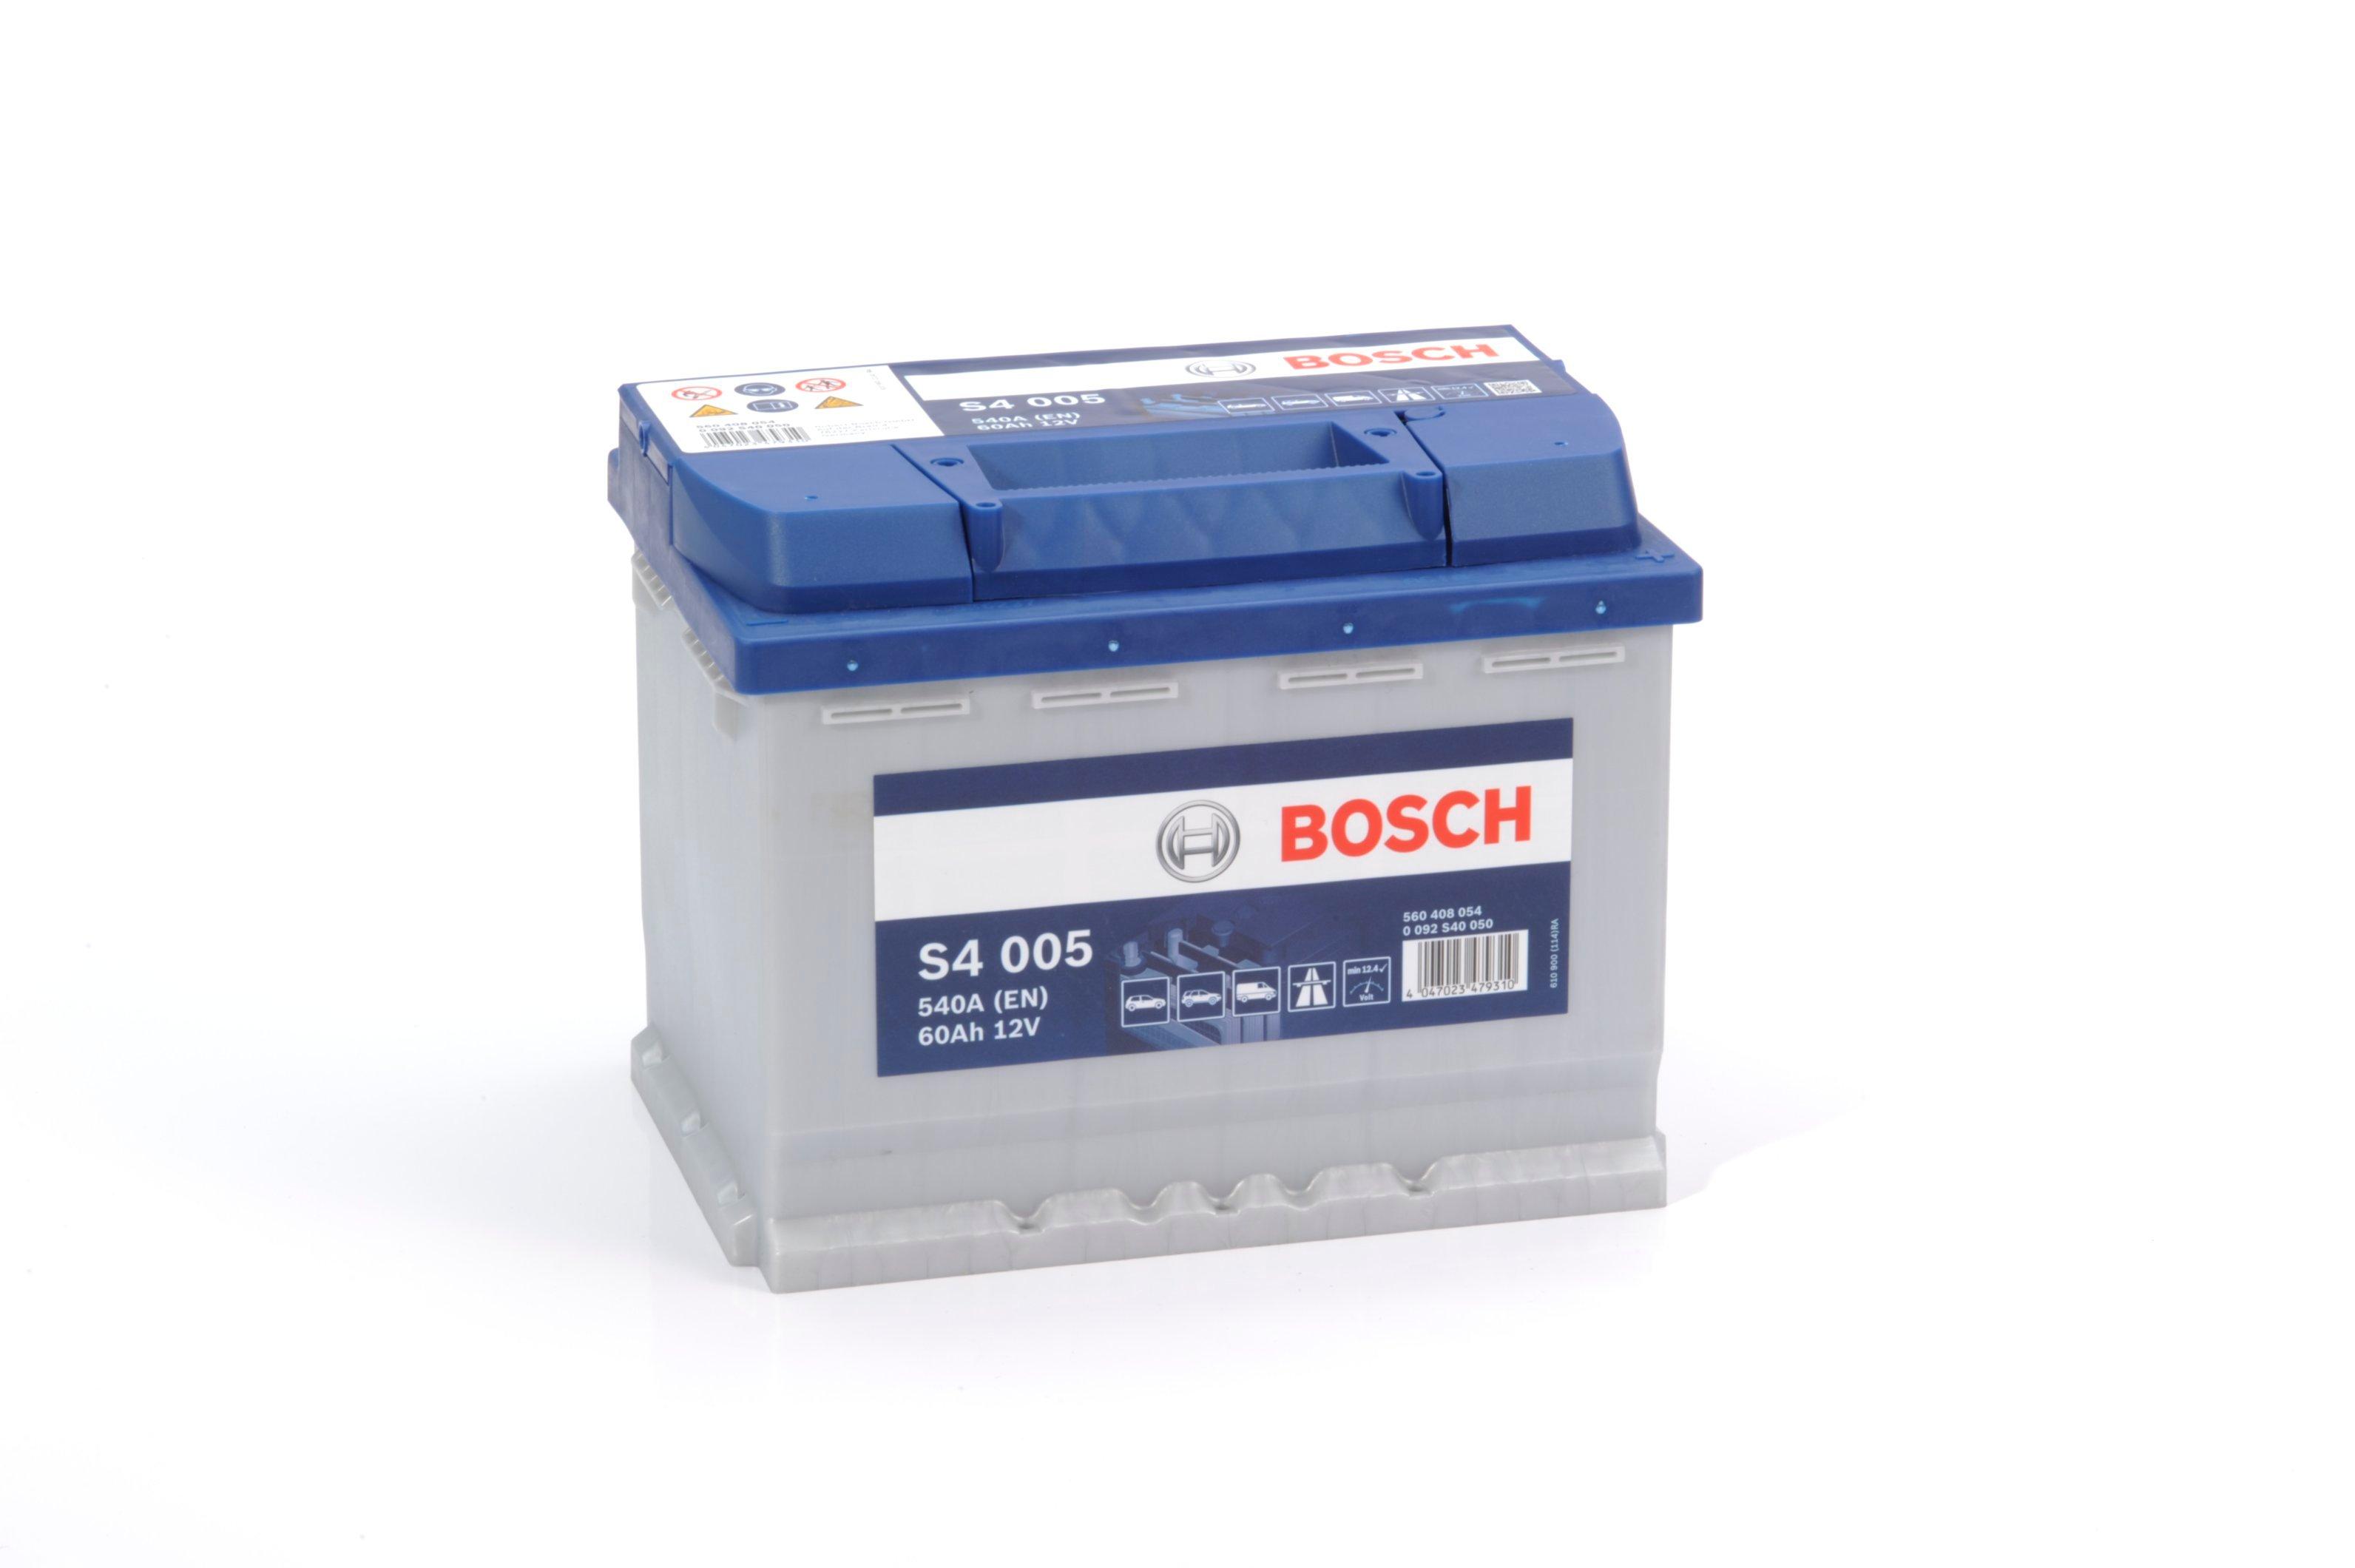 Батарея аккумуляторная Bosch S4 005 12В 60Ач 540A(EN) R+ Bosch 0 092 S40 050 - фото 11